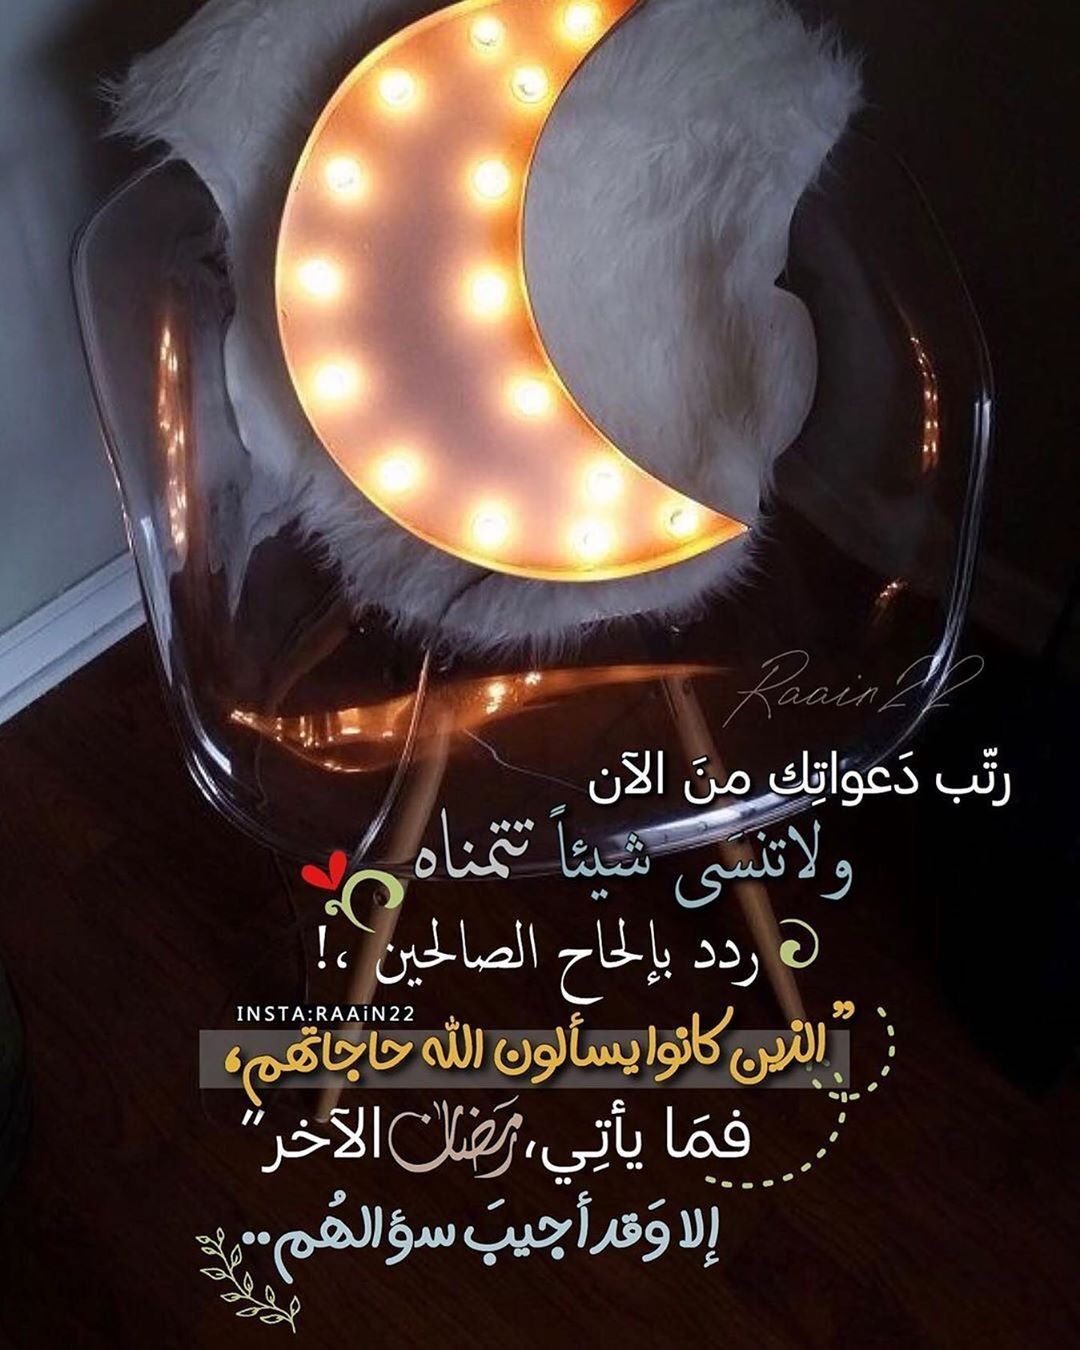 رمضان مبارك كل عام وانتم بخير Ramadan Betty Boop Movie Posters